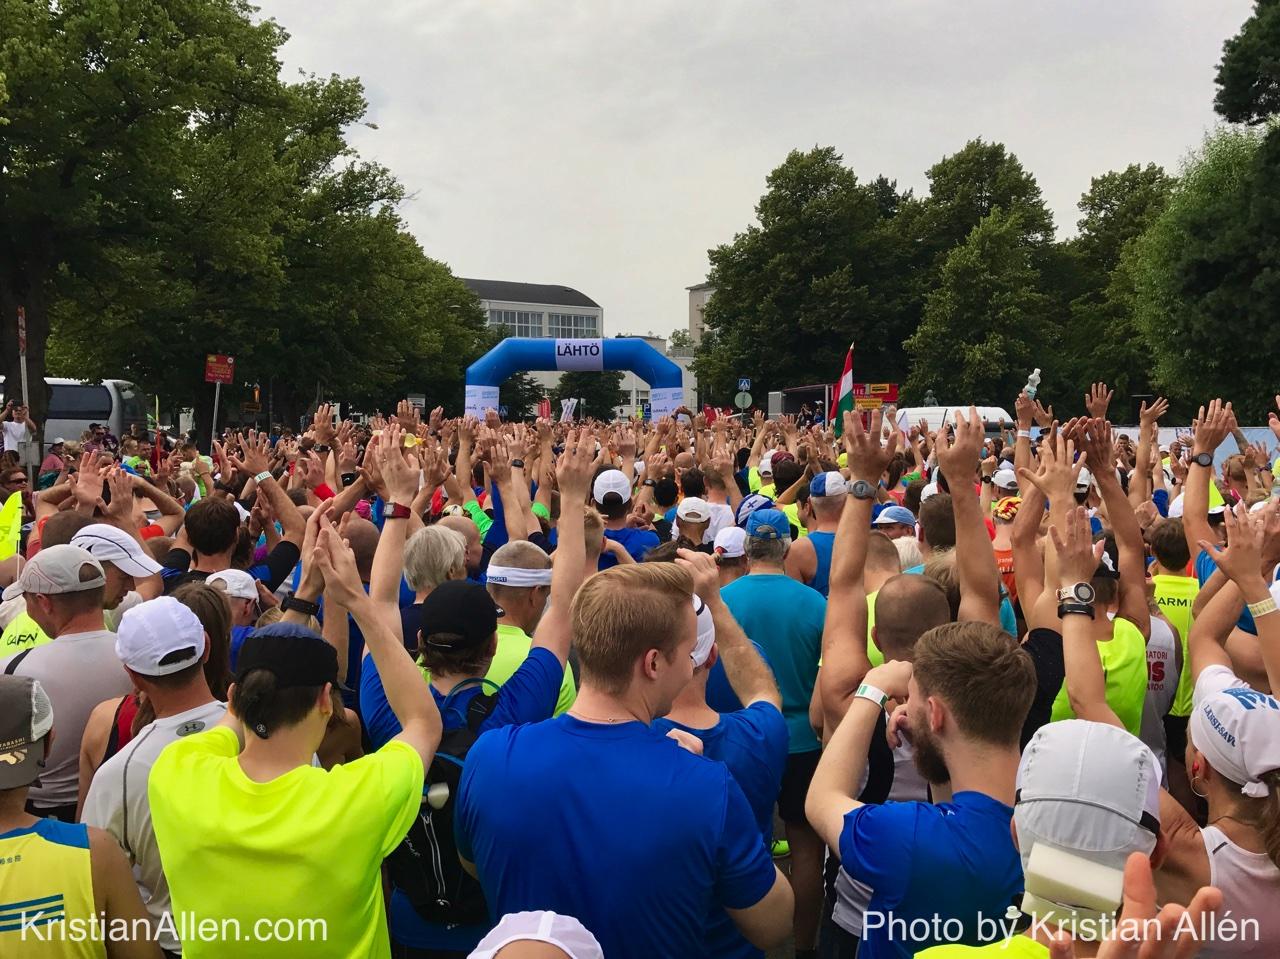 12.8.2017 44.02 km Run